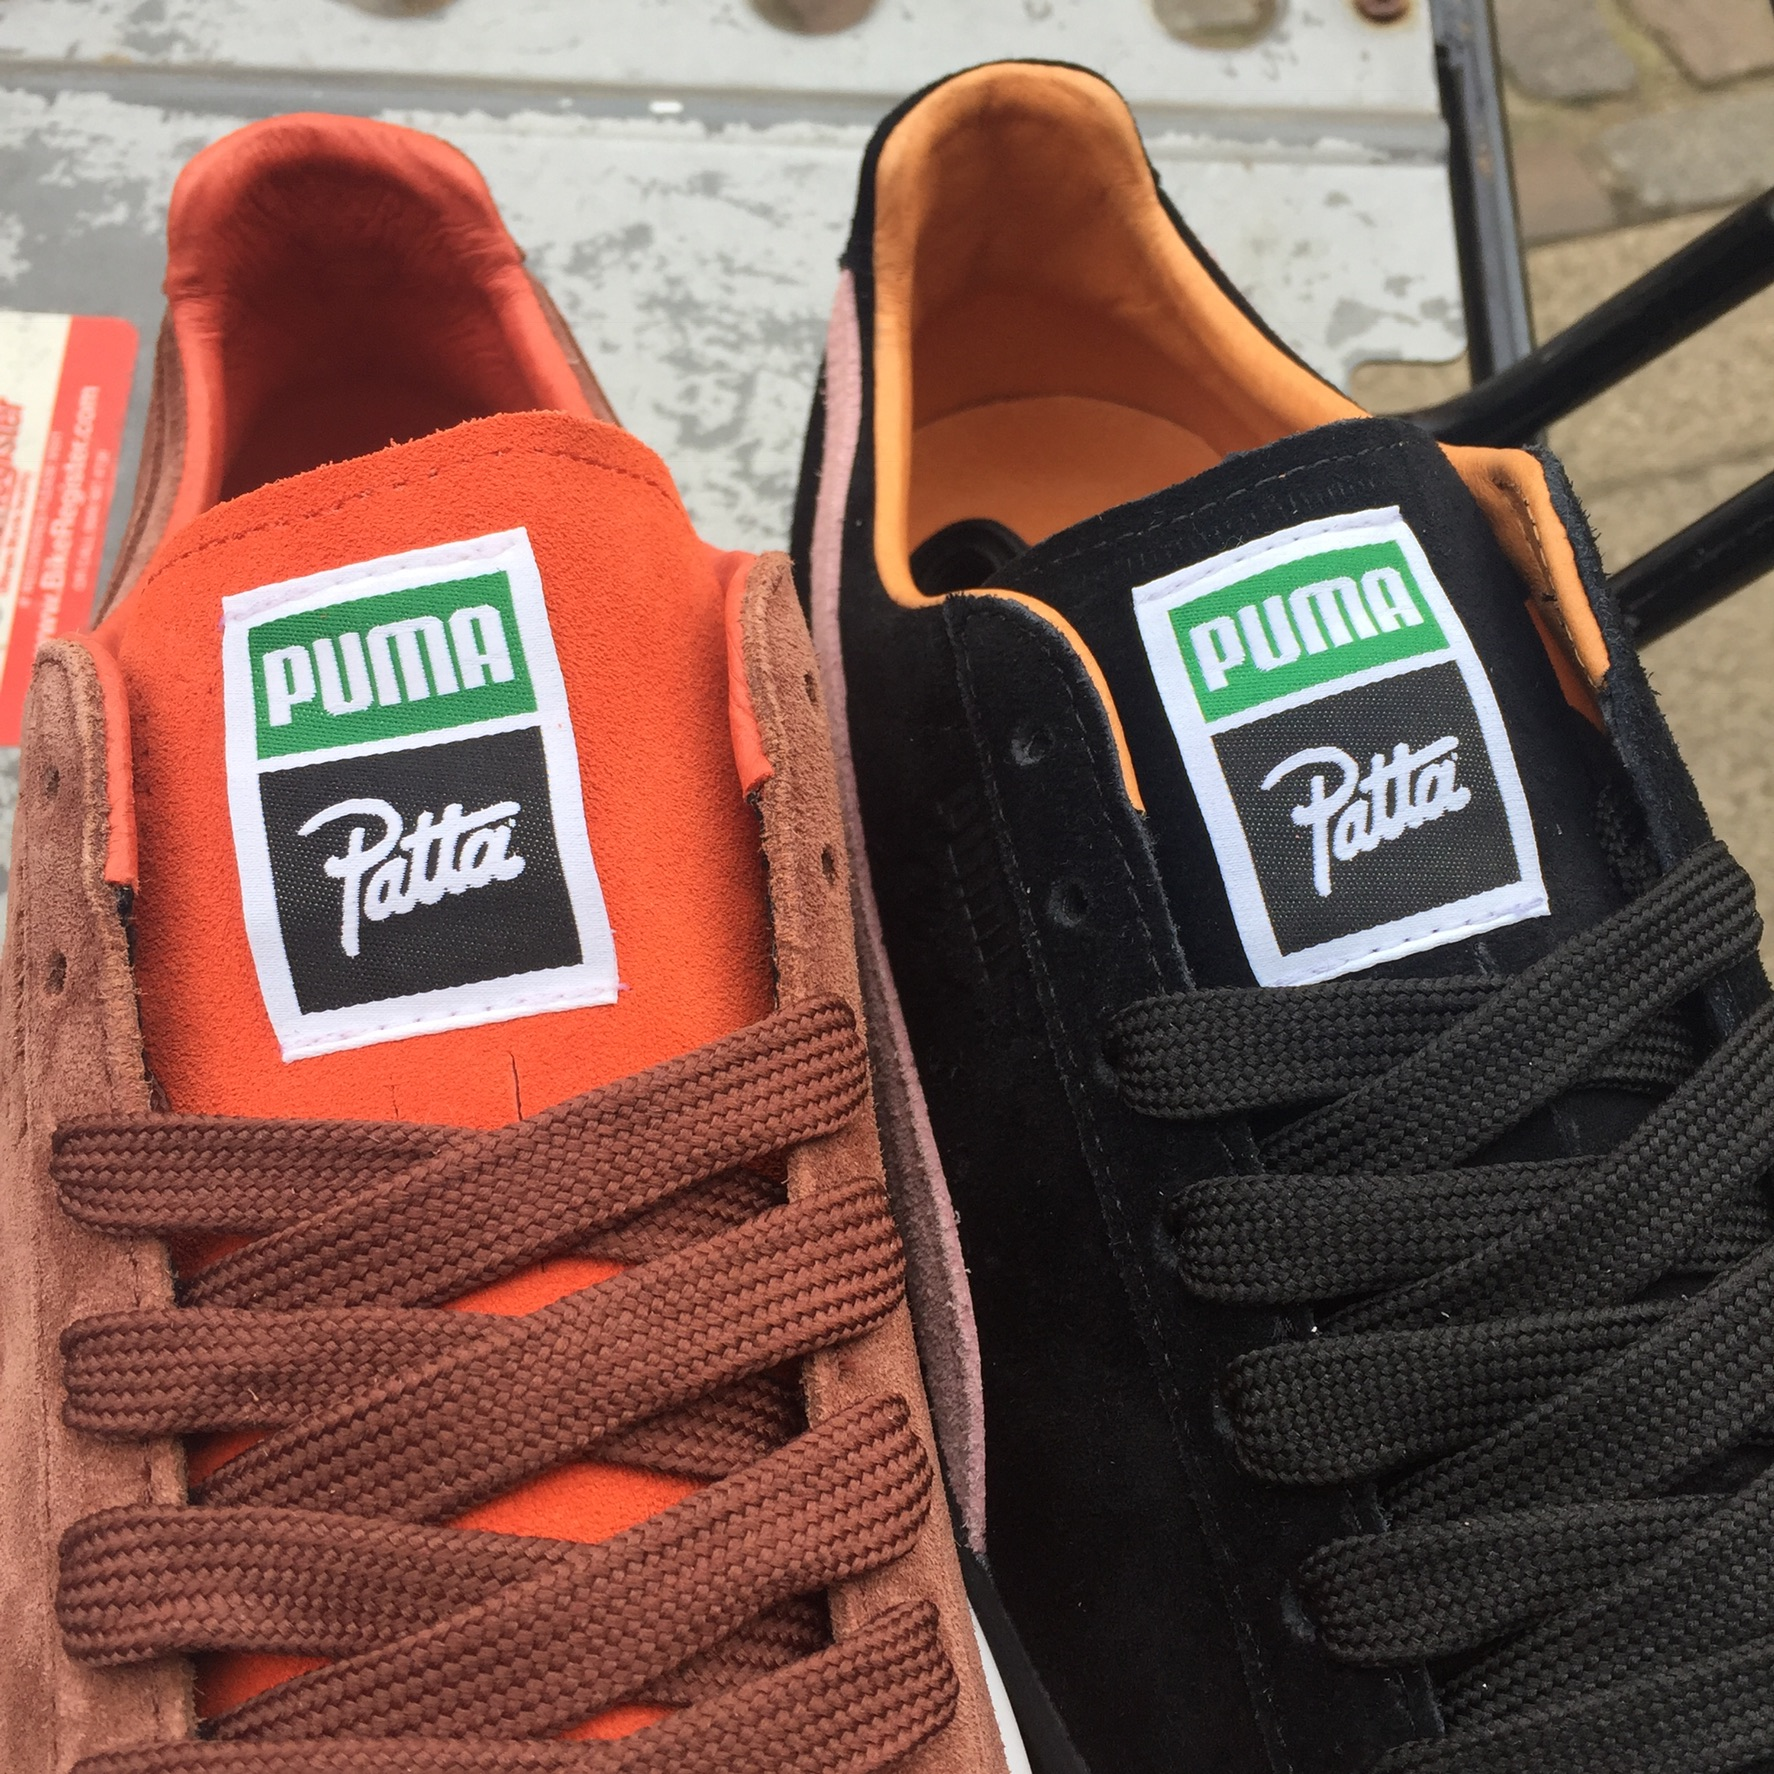 Puma Clyde x PATTA - Features